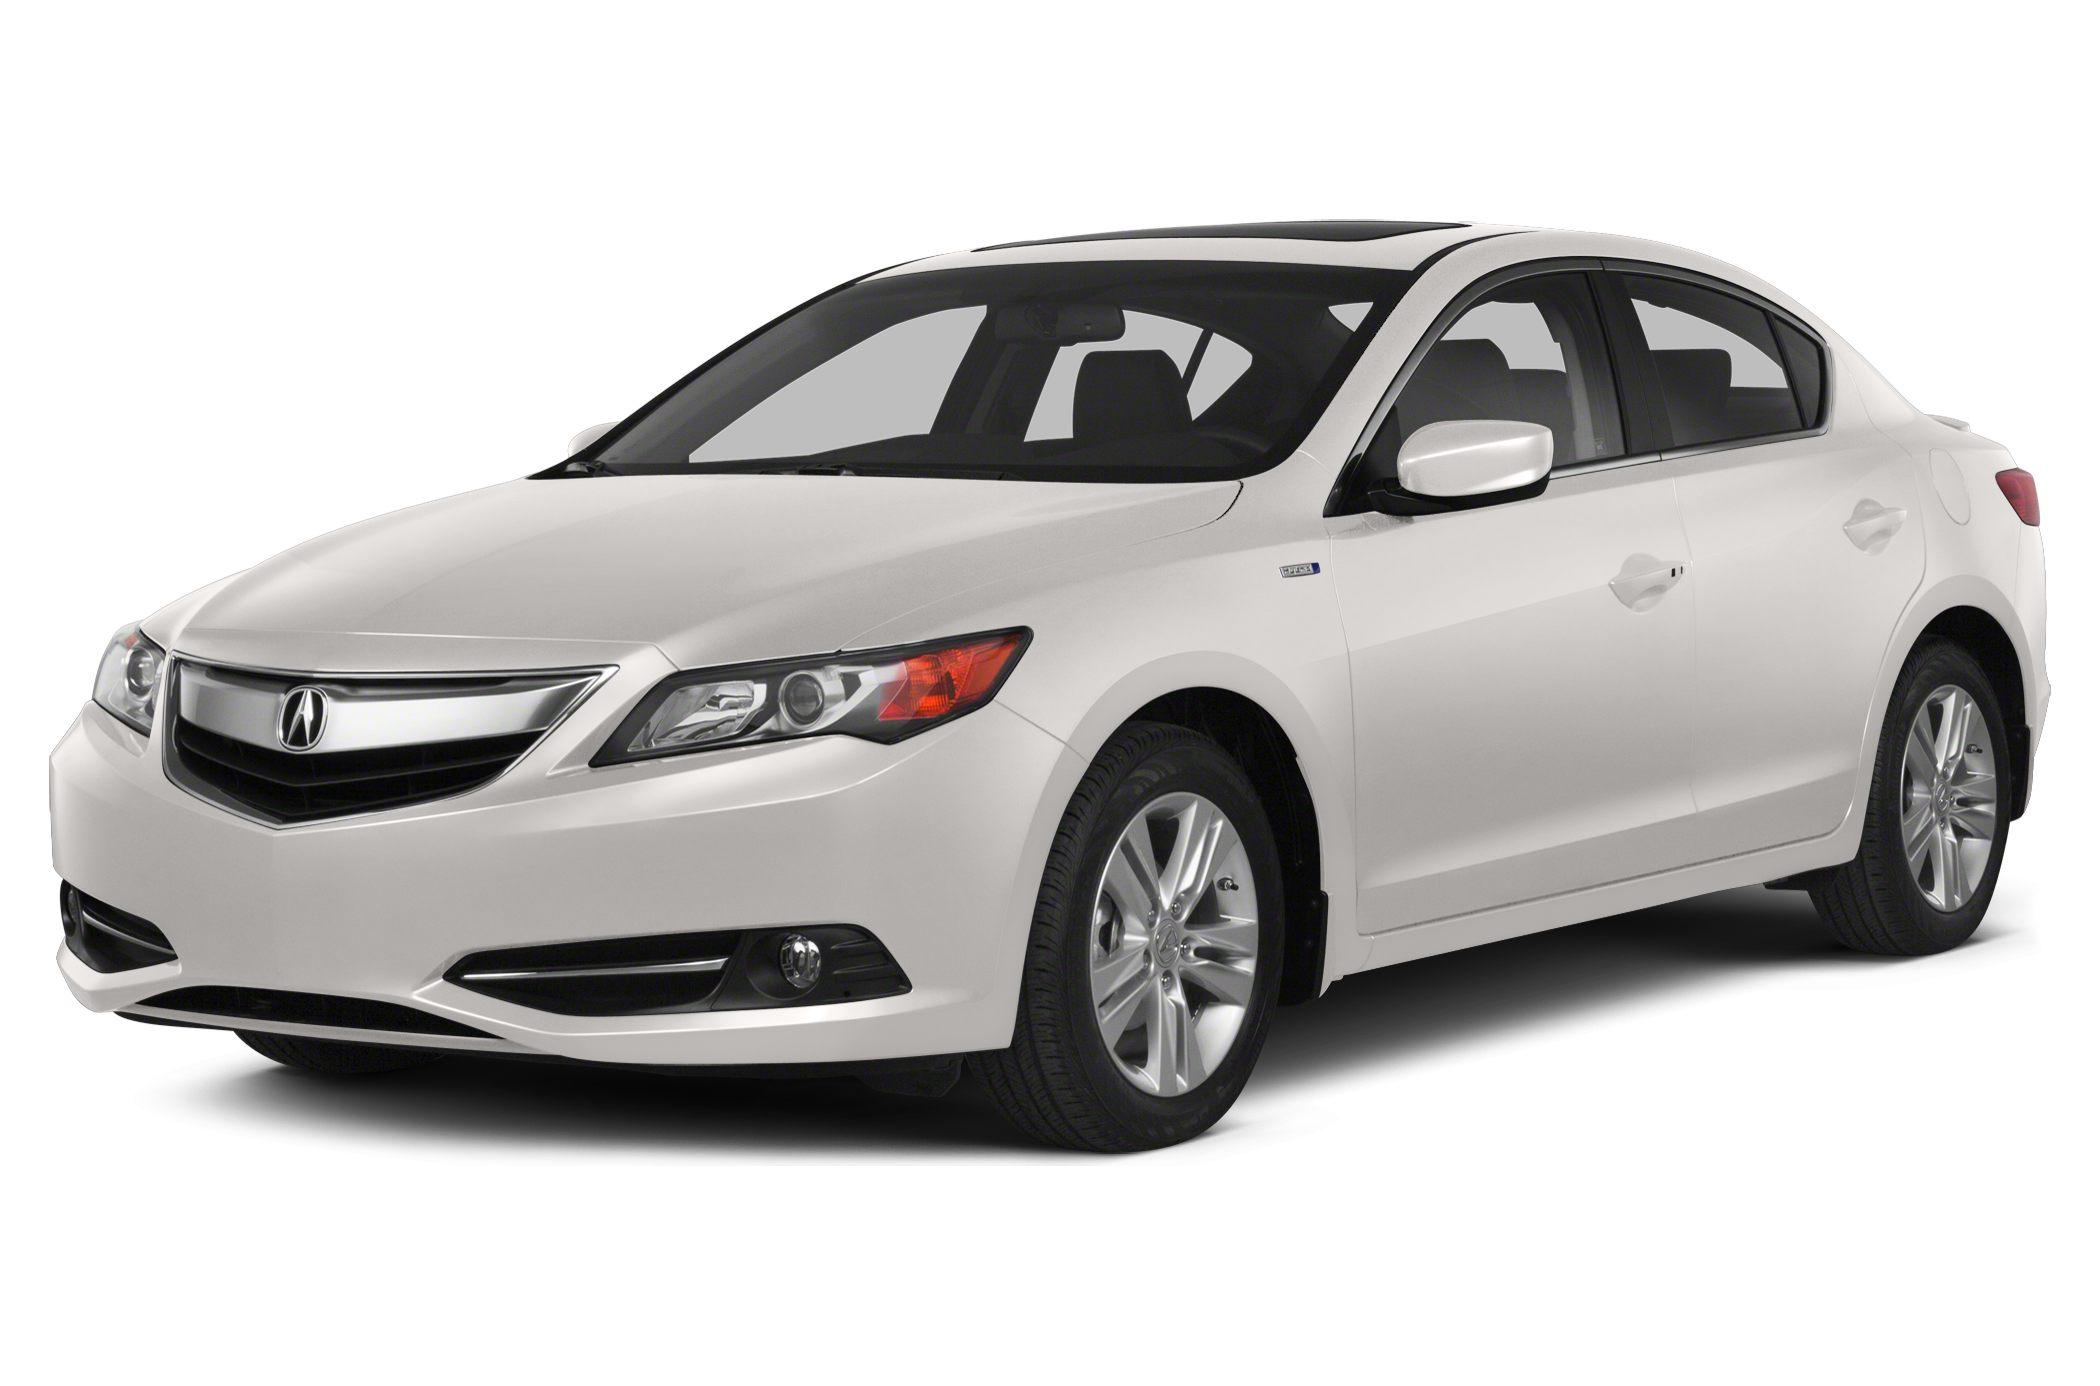 2014 Acura ILX Hybrid 1.5L Sedan for sale in Davis for $28,500 with 1,012 miles.